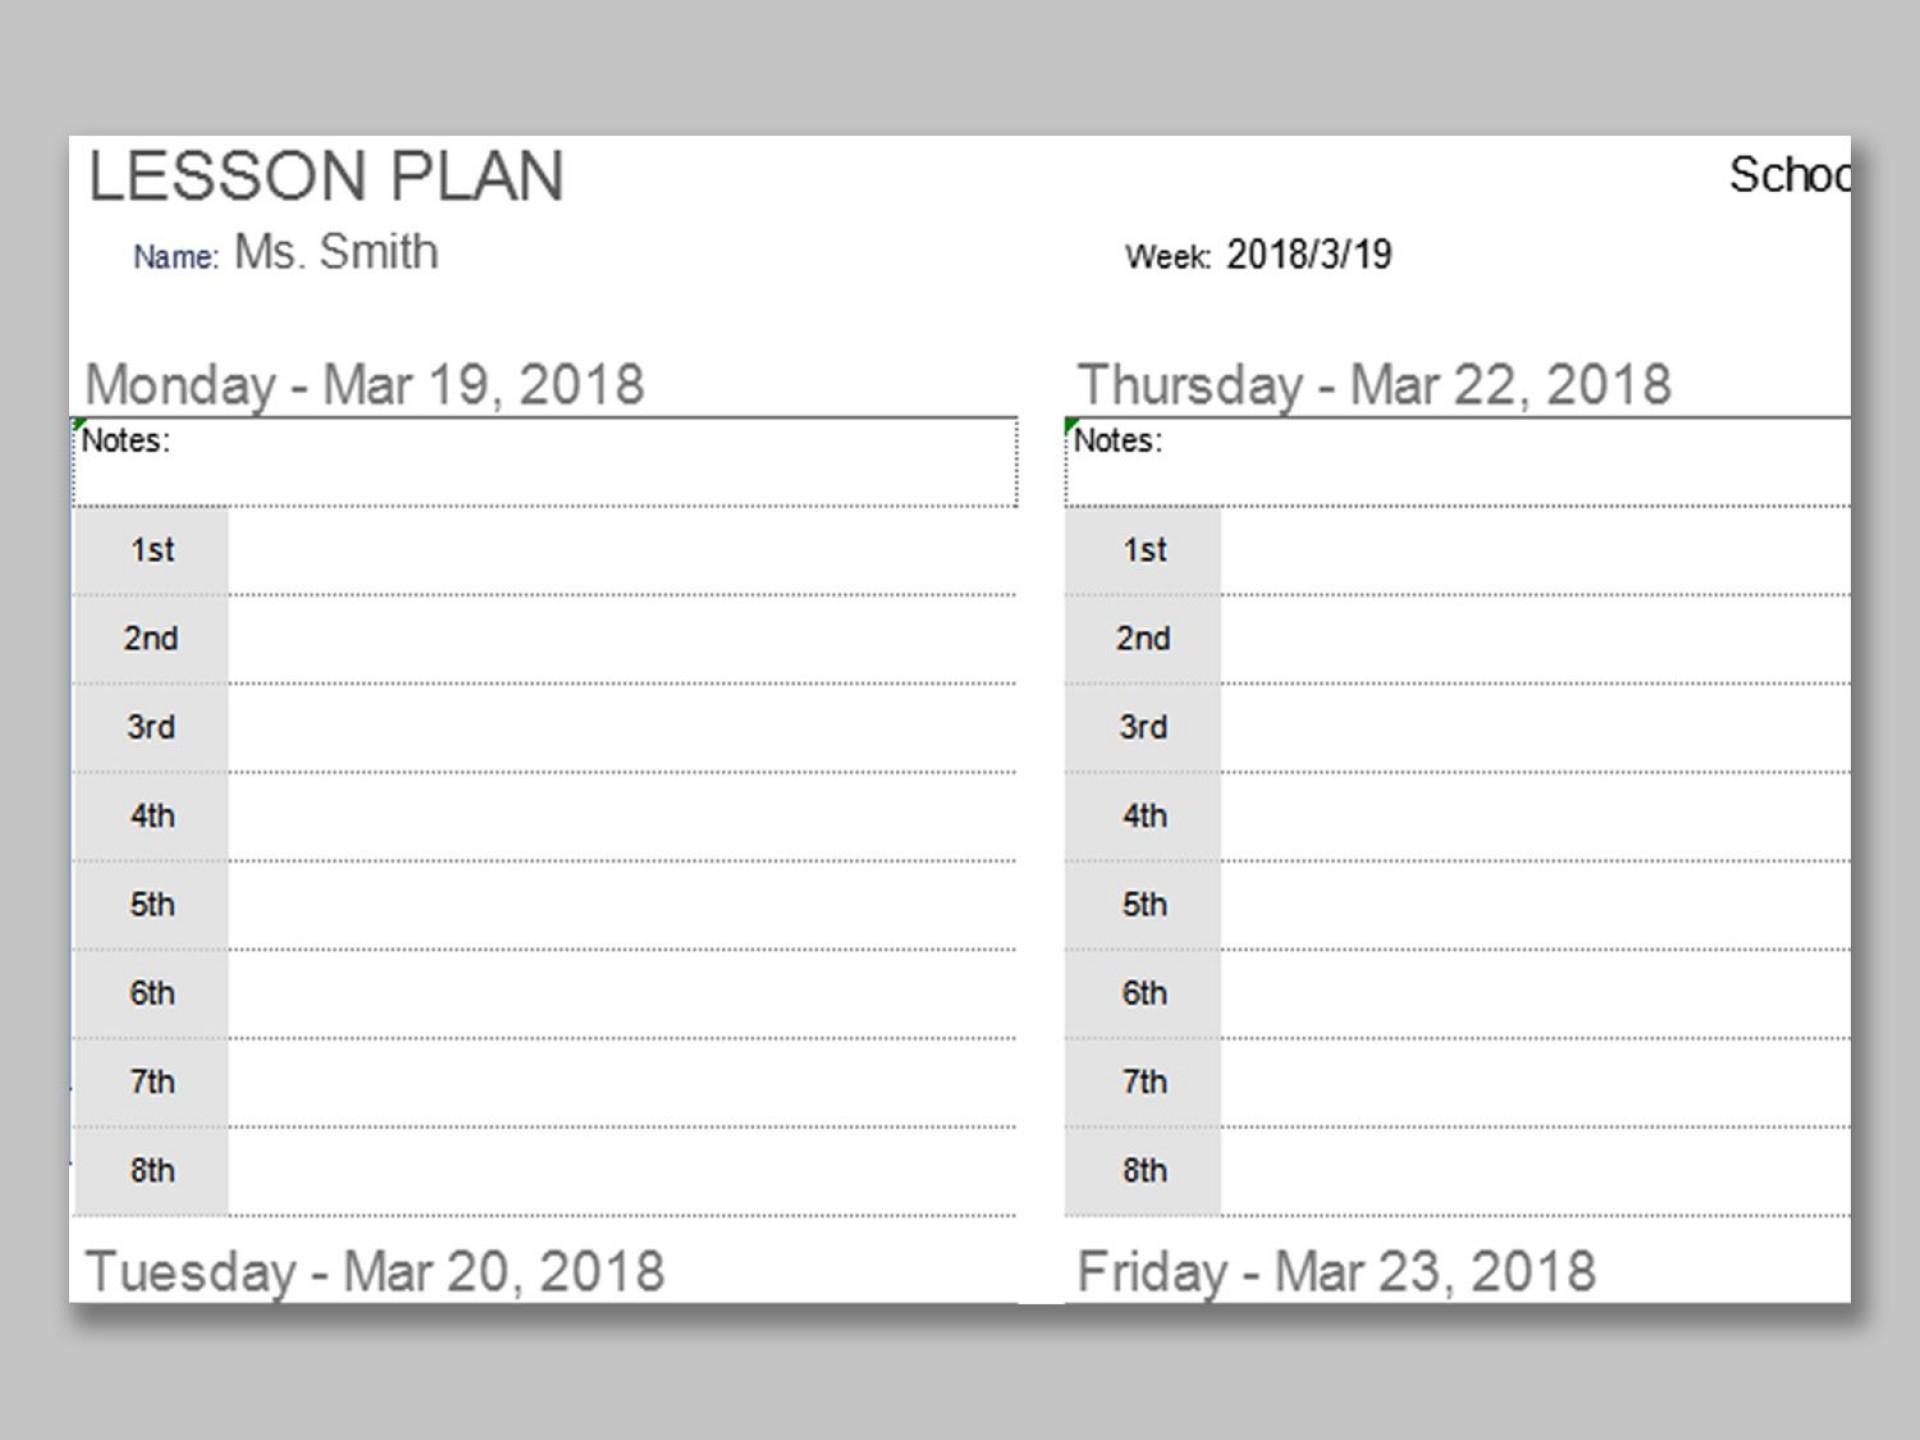 000 Phenomenal Lesson Plan Template Excel Free Inspiration 1920